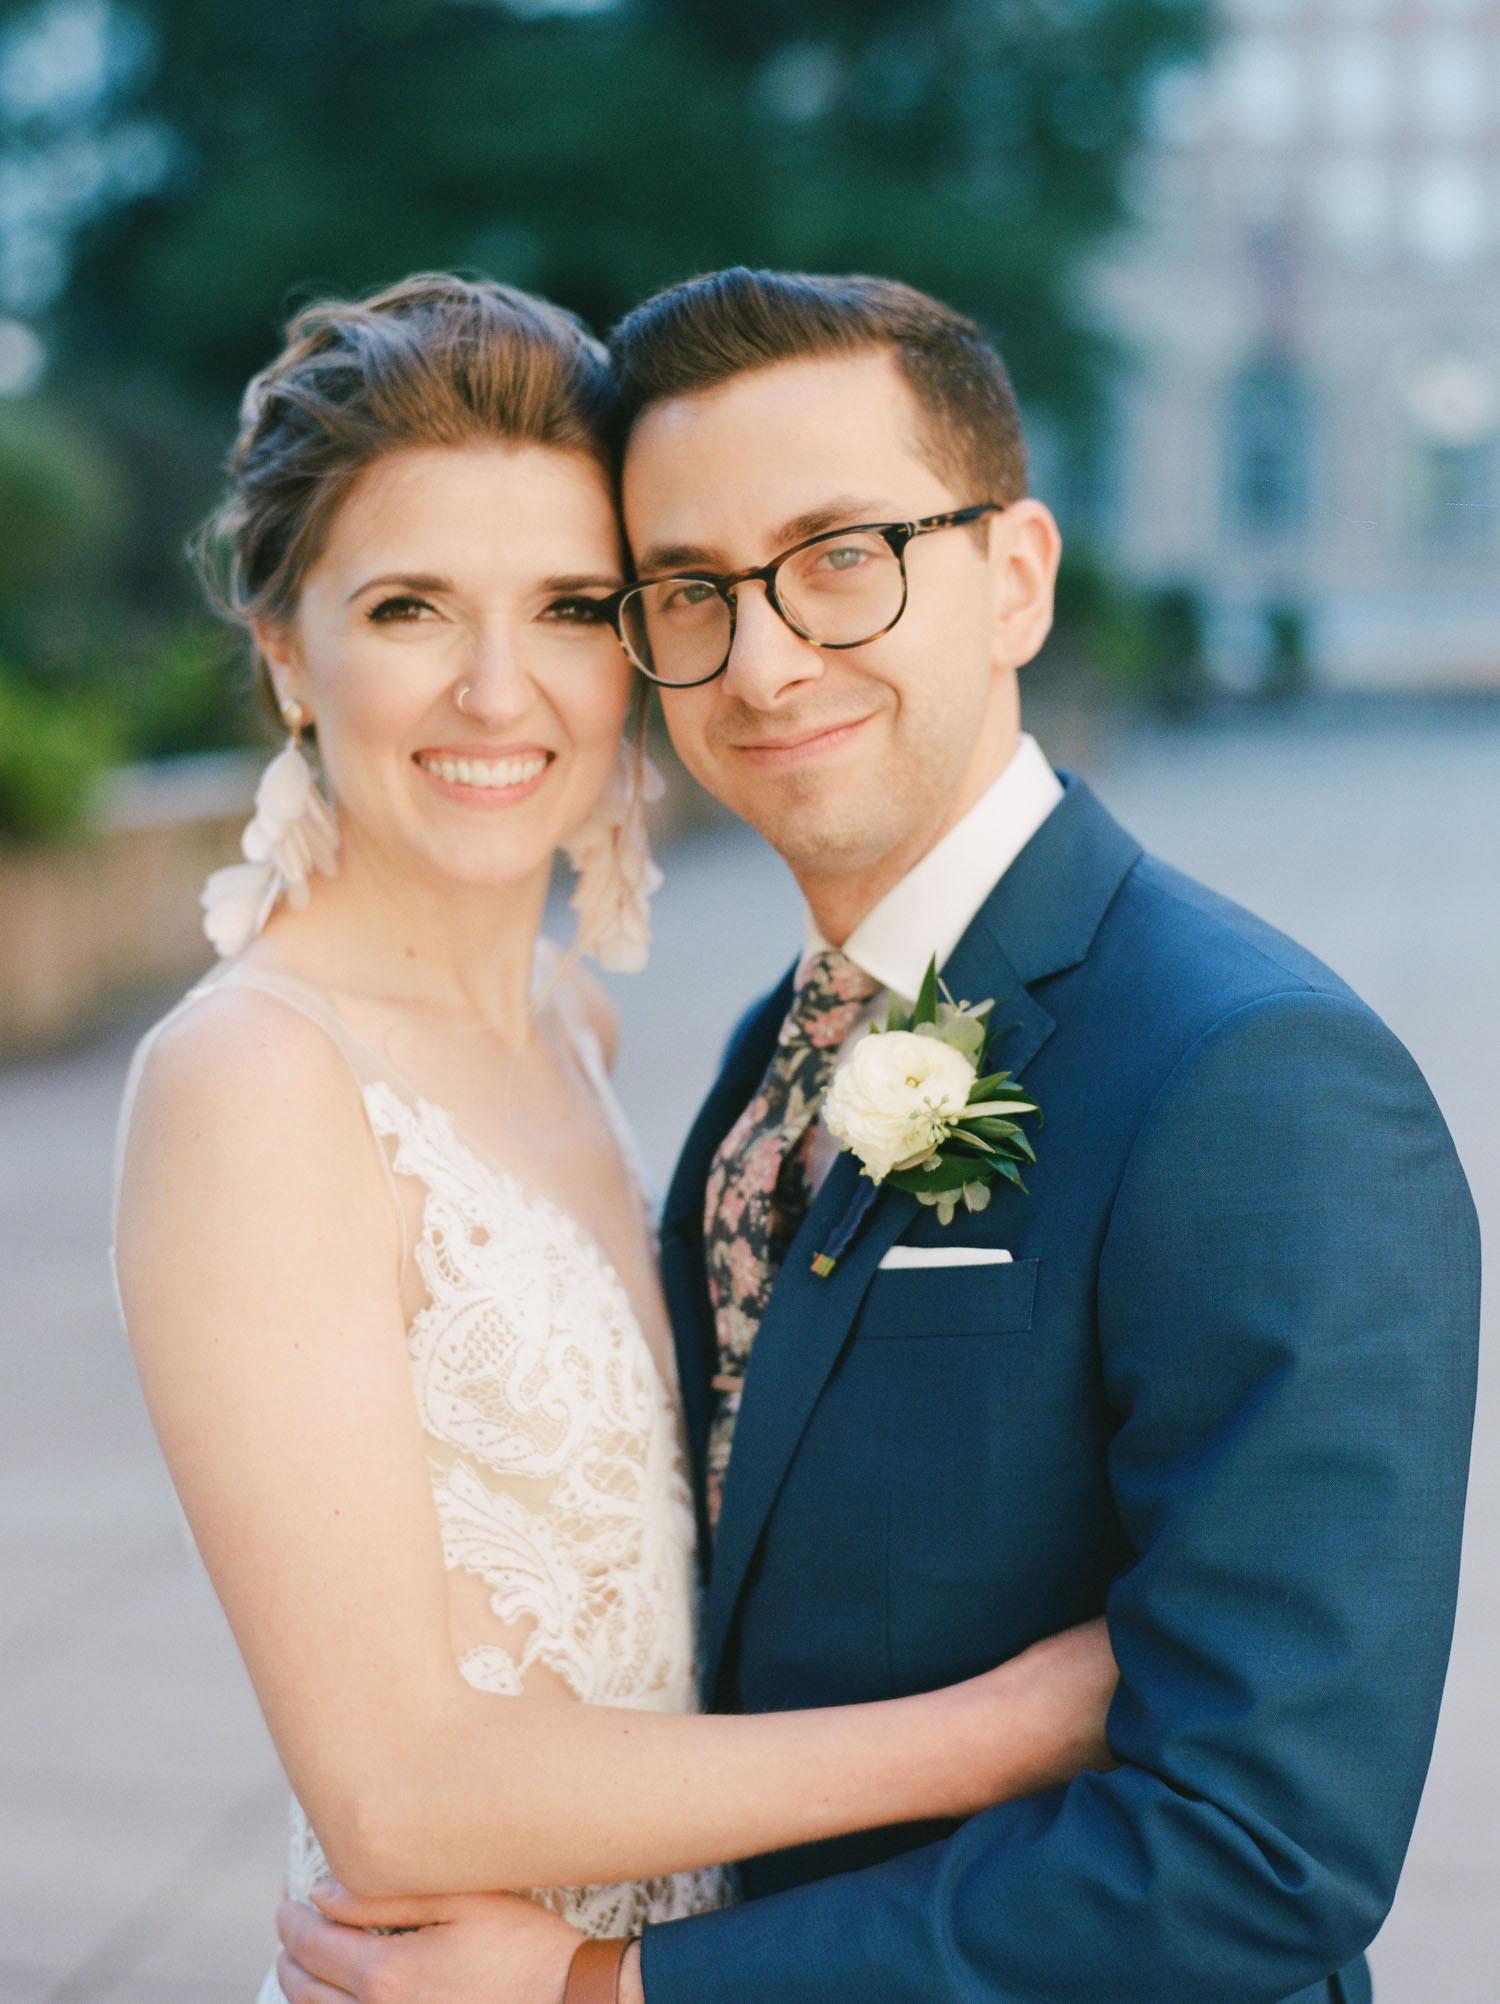 kateweinsteinphoto_alexella_wedding-355.jpg